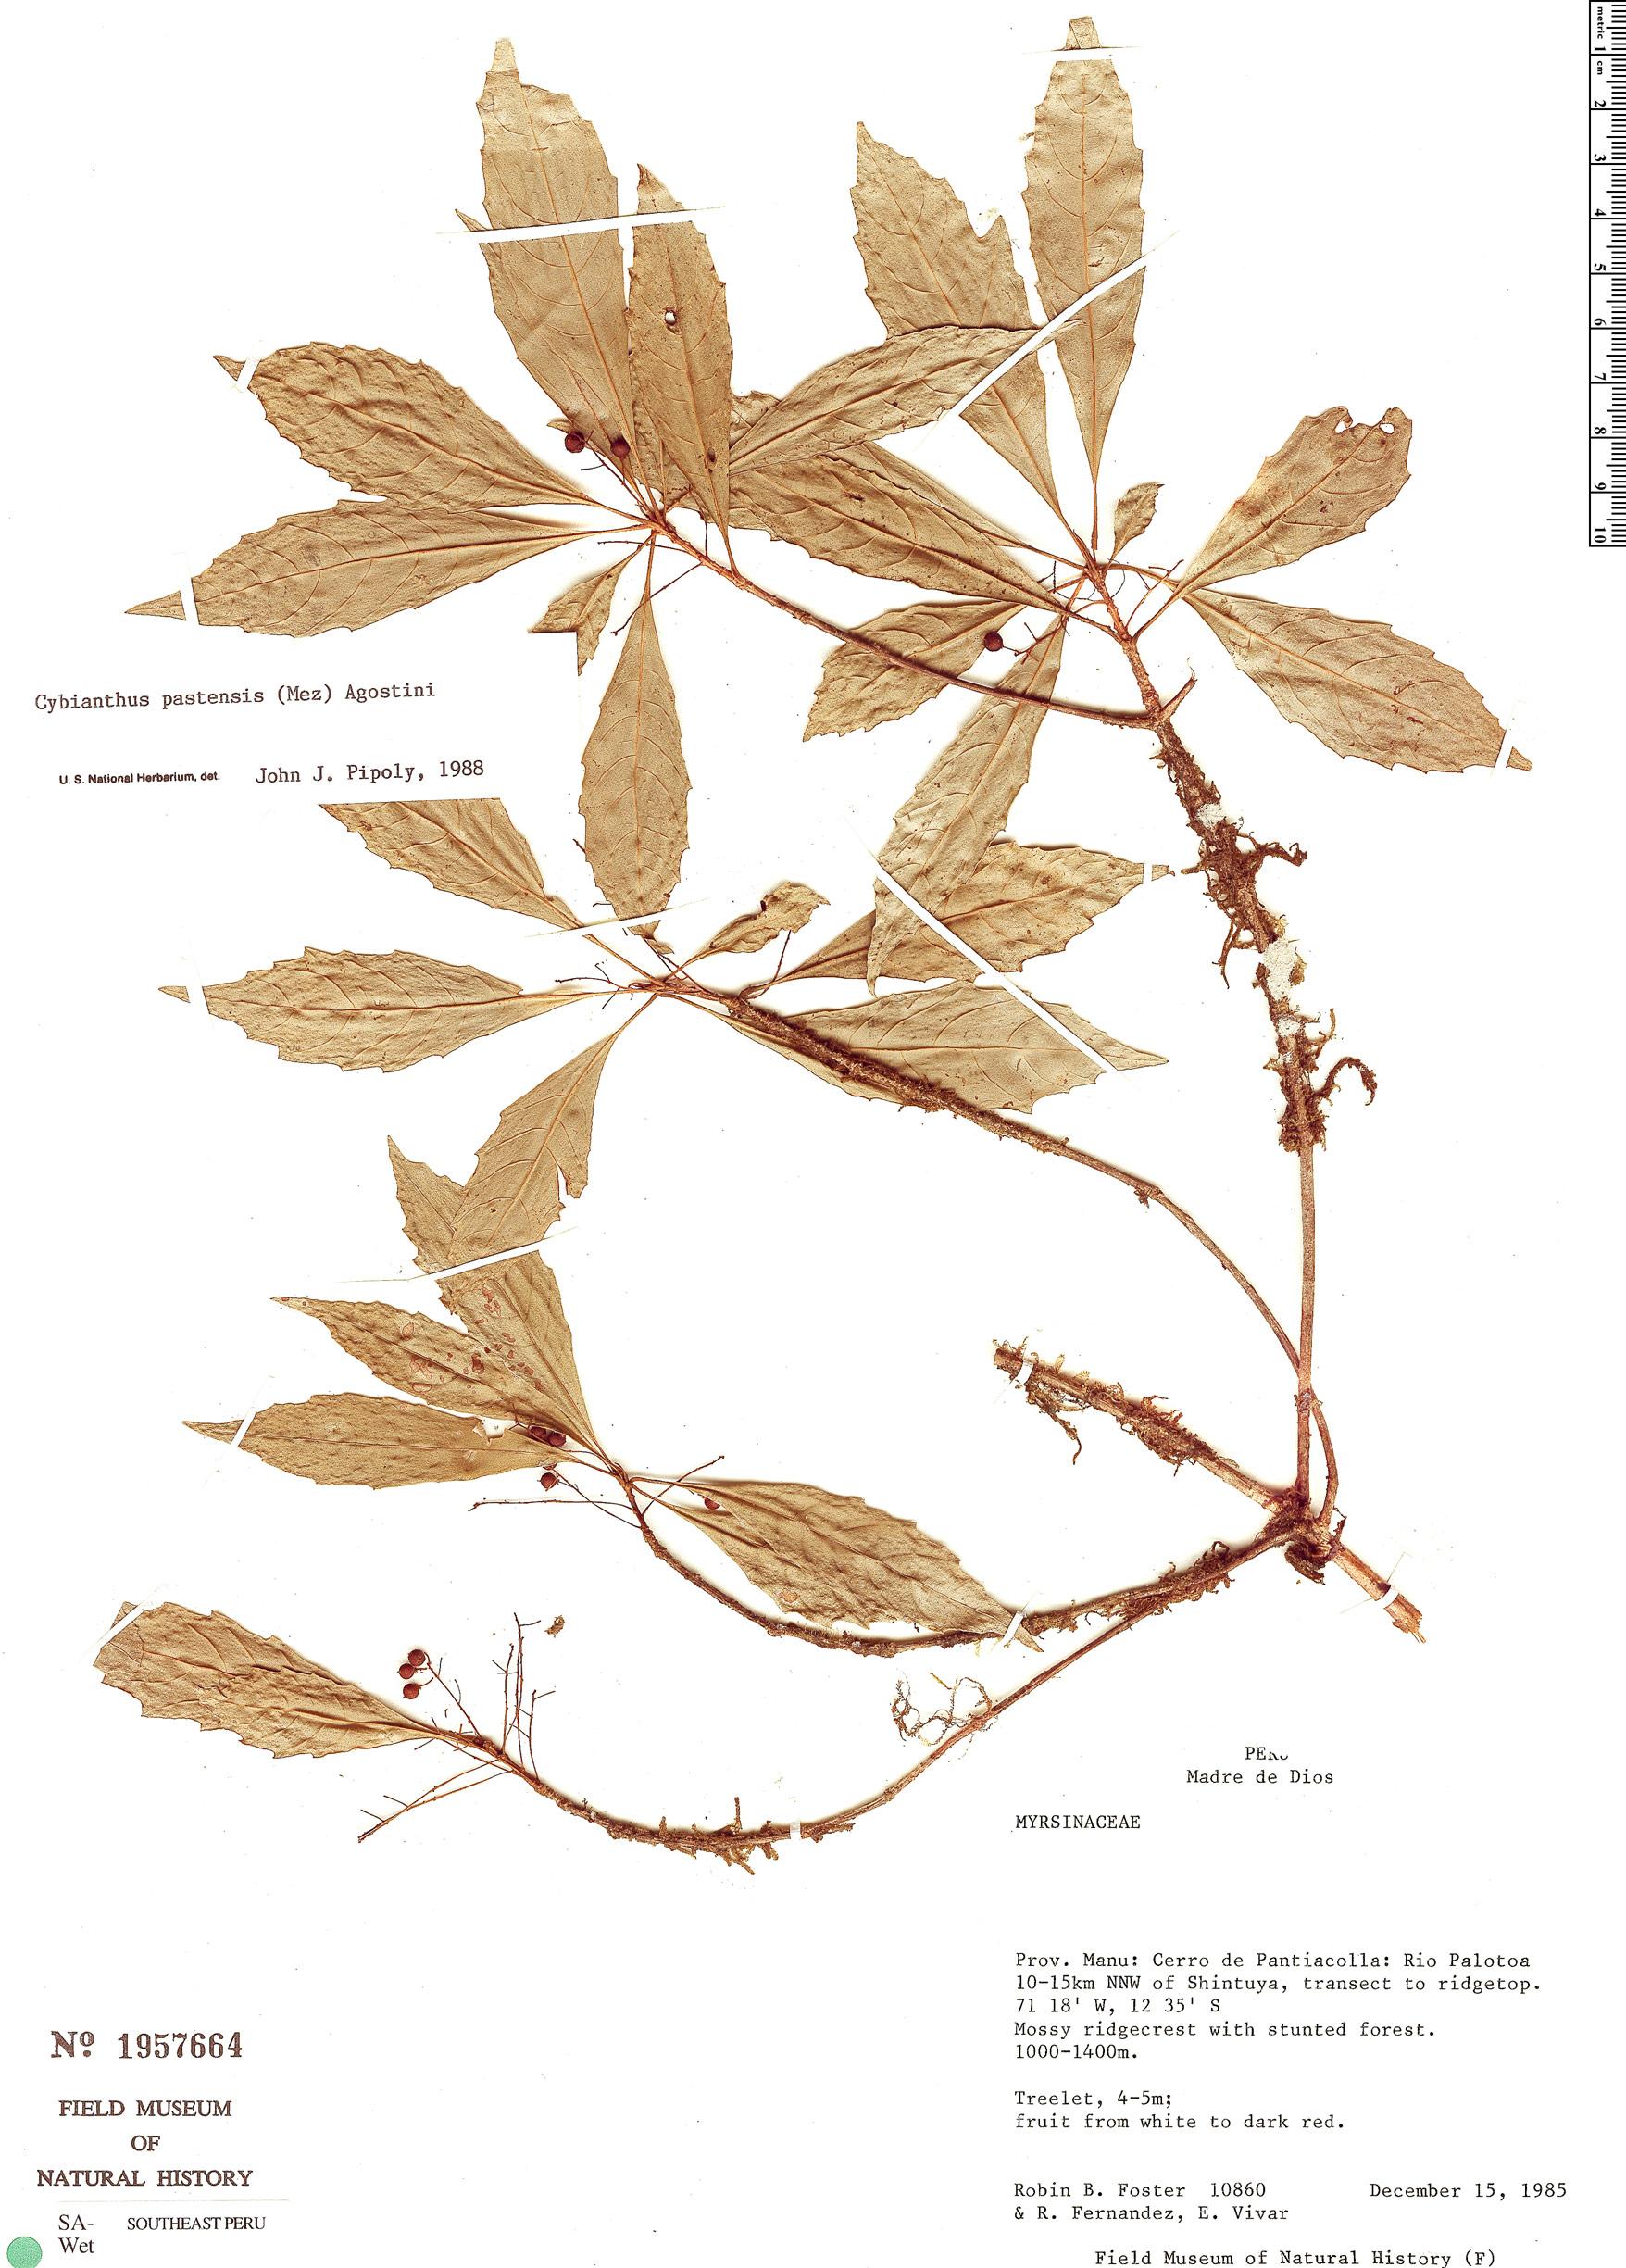 Specimen: Cybianthus pastensis